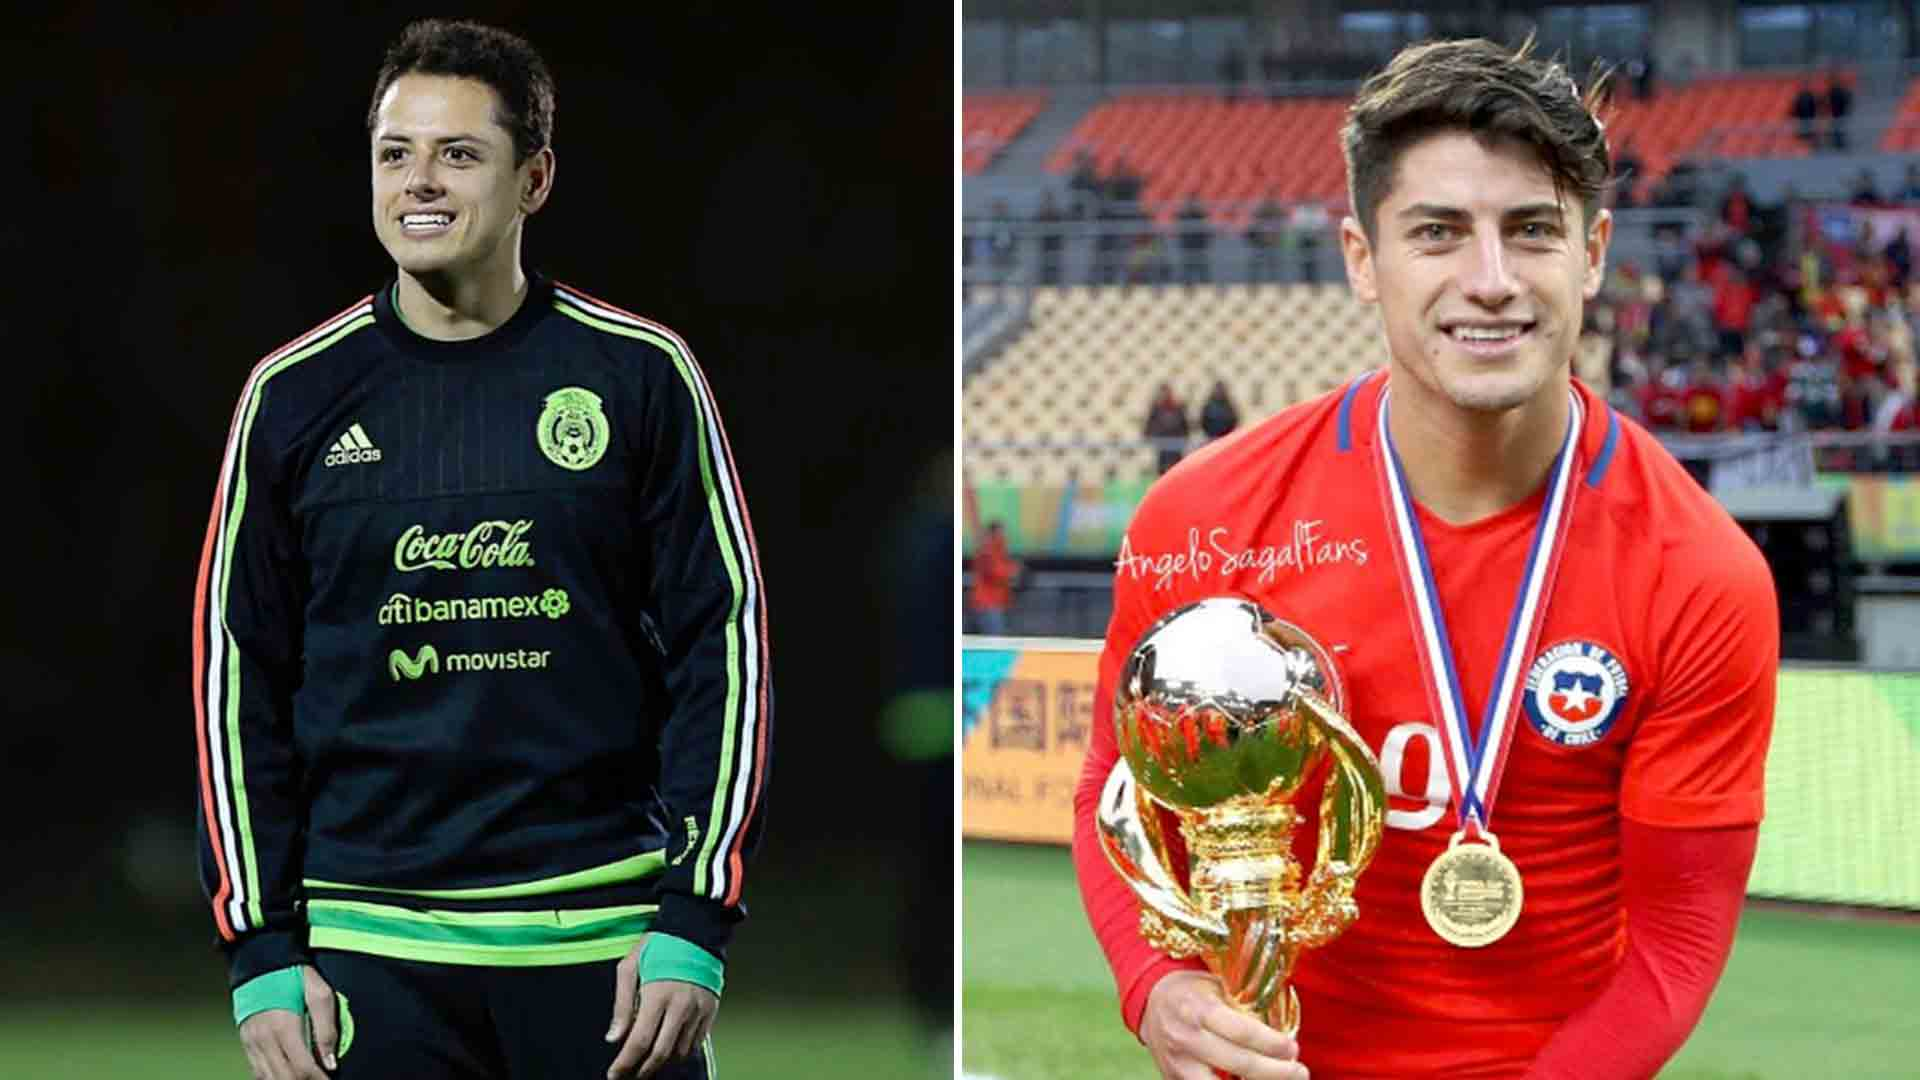 Confederation Cup Calendario.2017 Fifa Confederations Cup Meet The Hottest Latino